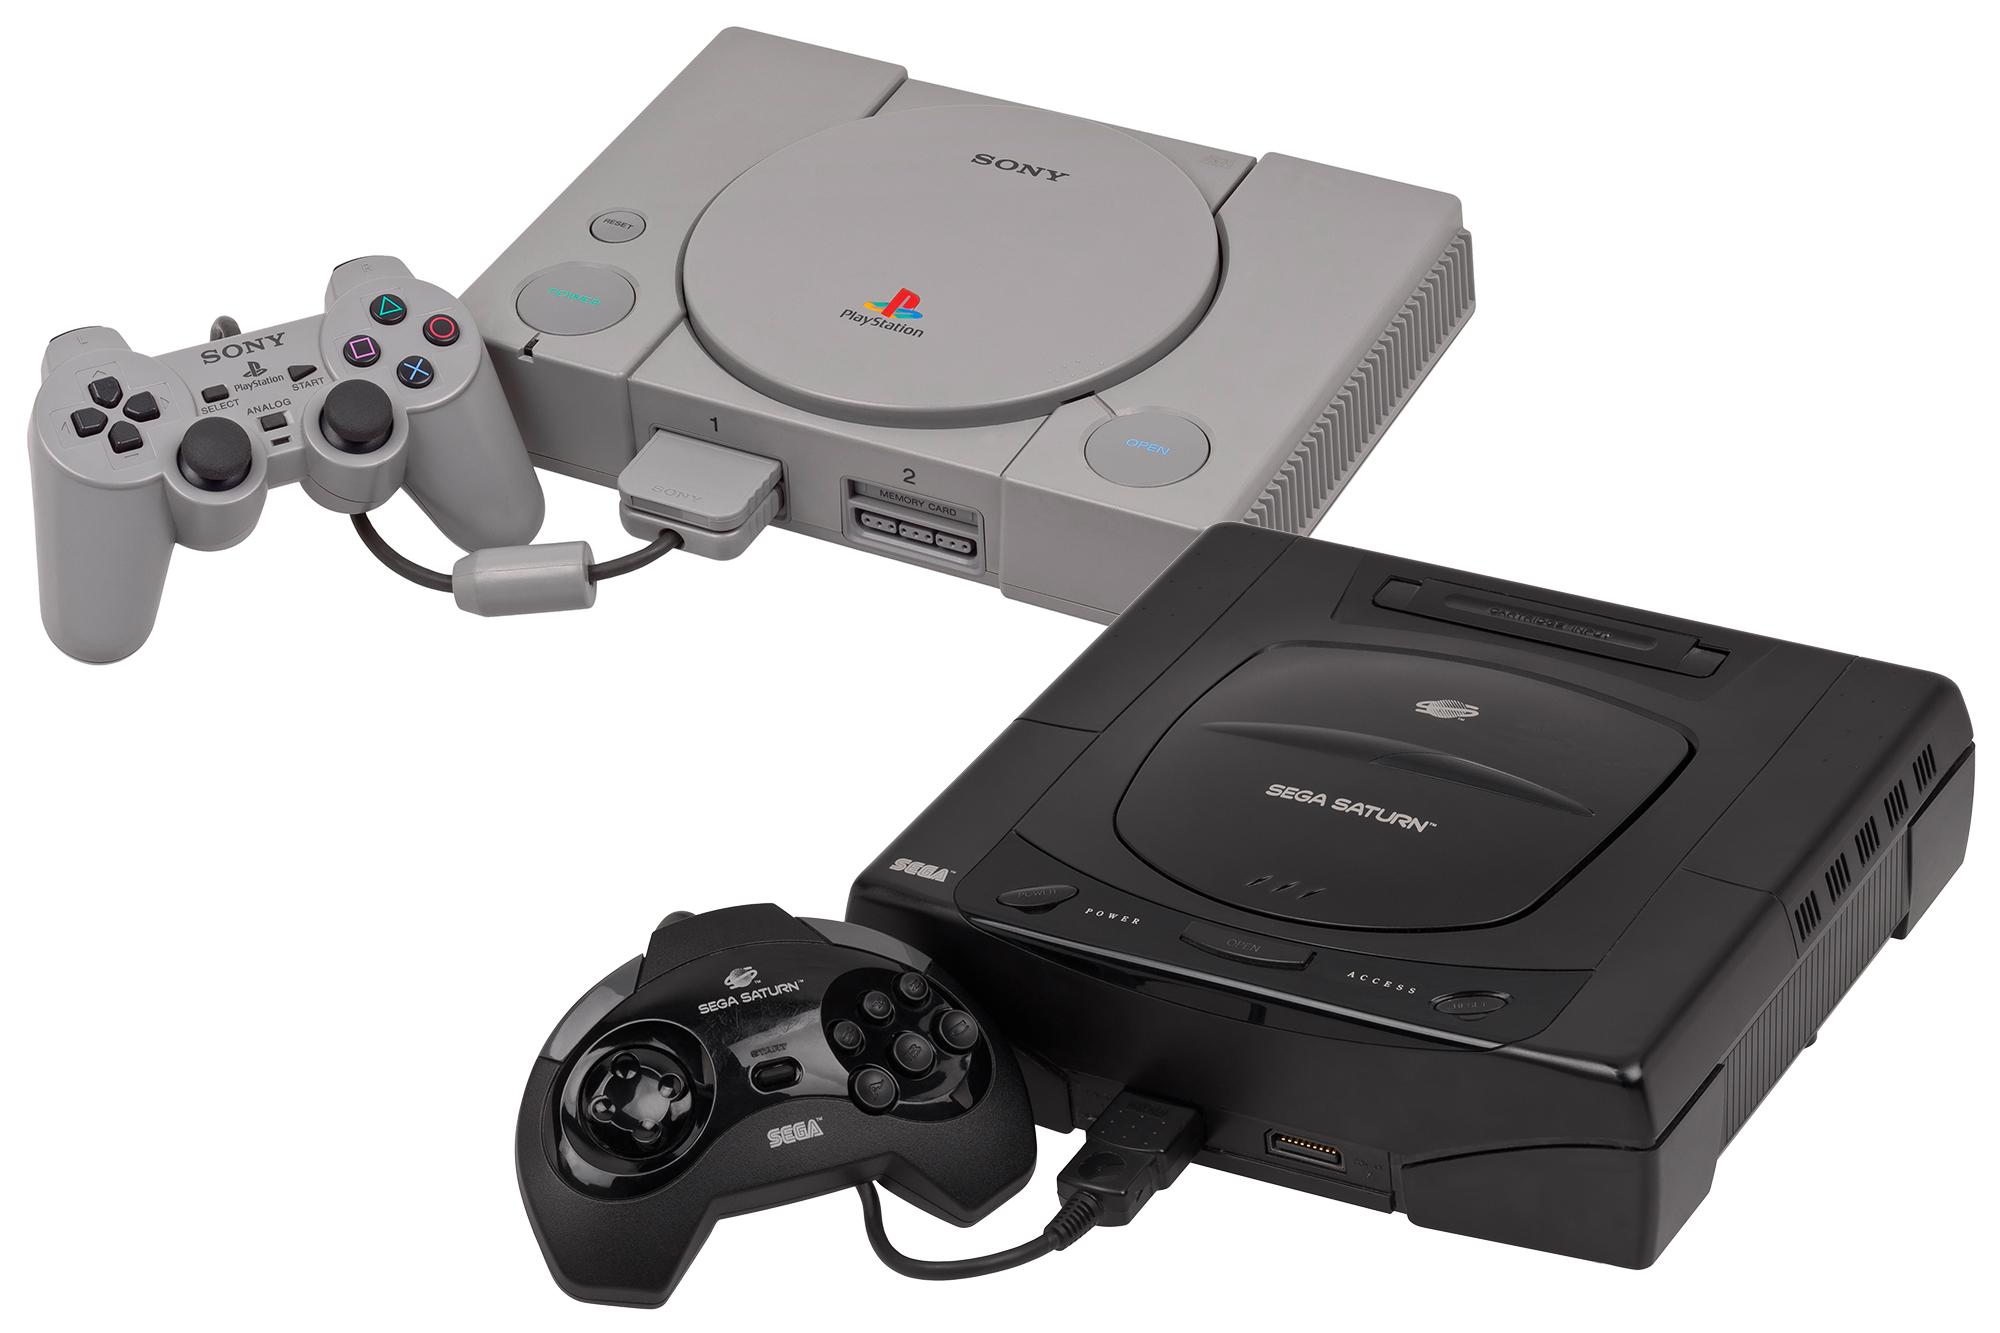 Sony PlayStation Sega Saturn